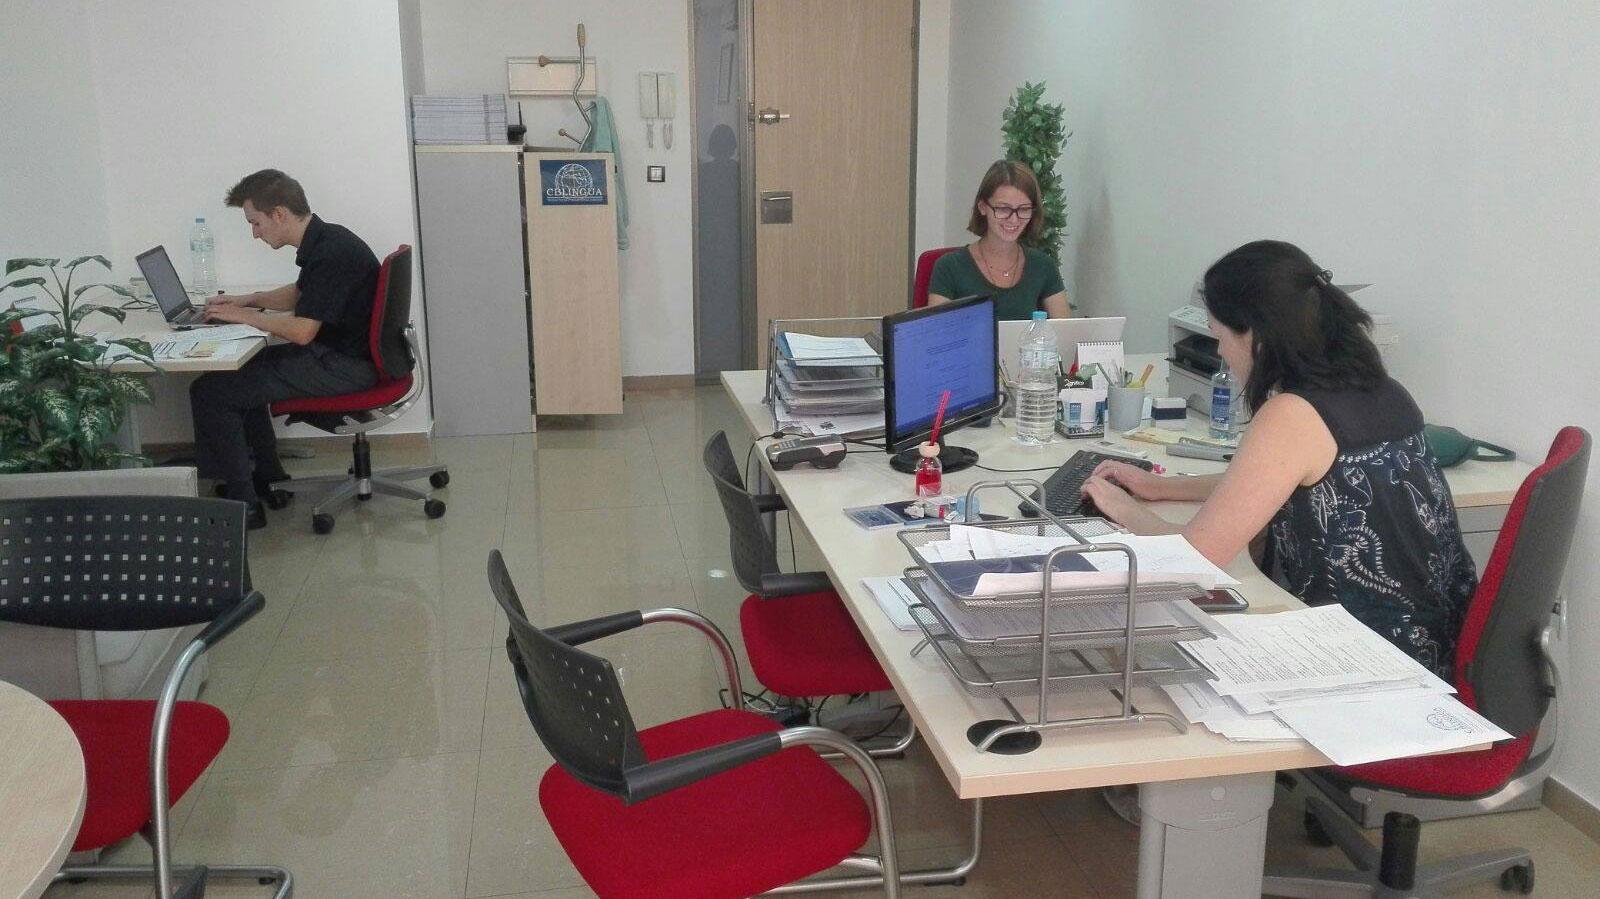 CBLingua Sevilla - Agencia de traducción